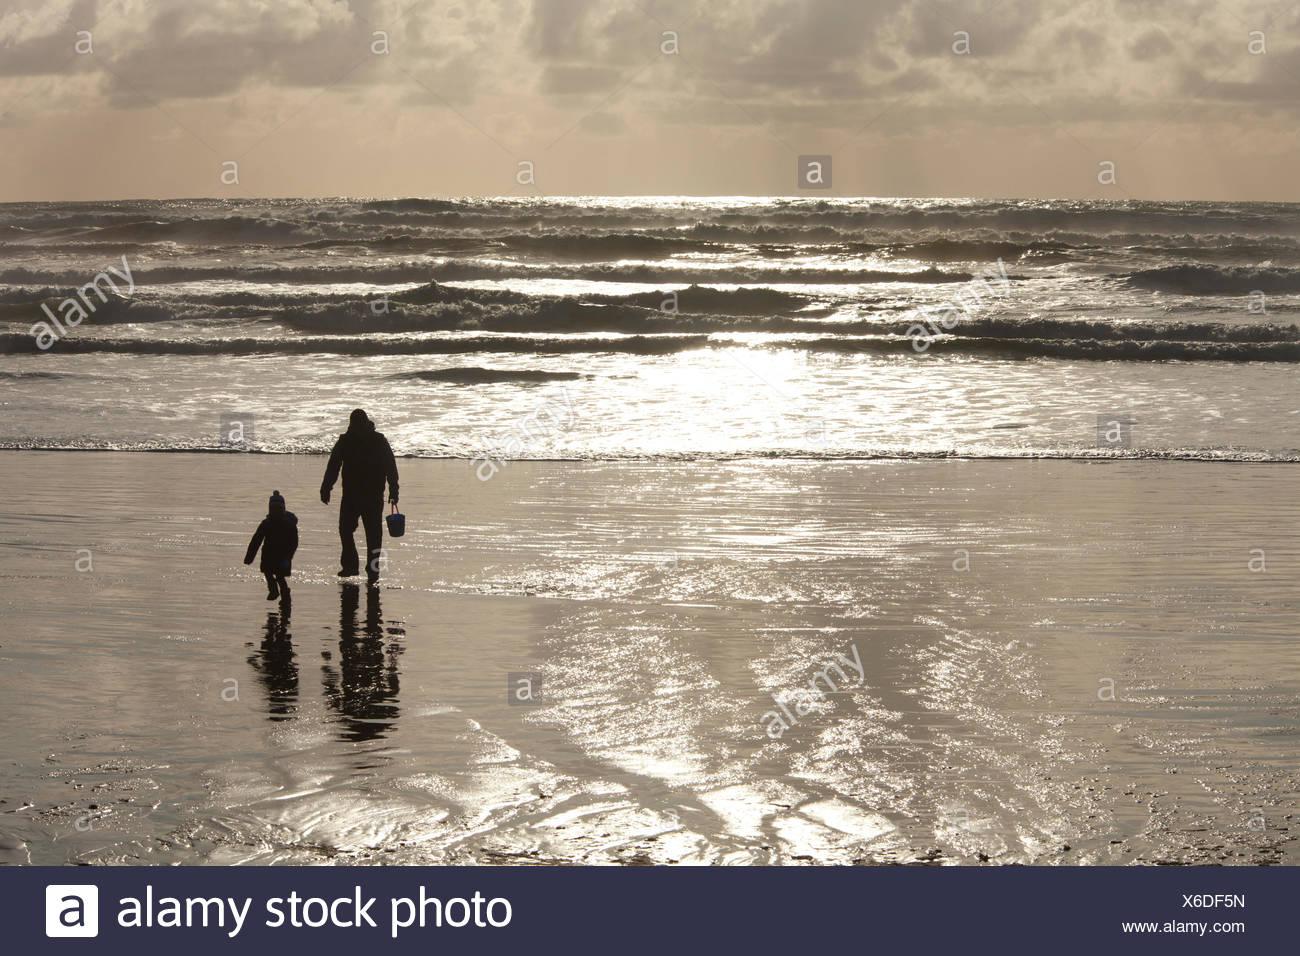 Cox bay near tofino stock photos cox bay near tofino stock a father daughter on cox bay beach near tofino british columbia canada on vancouver island in nvjuhfo Image collections